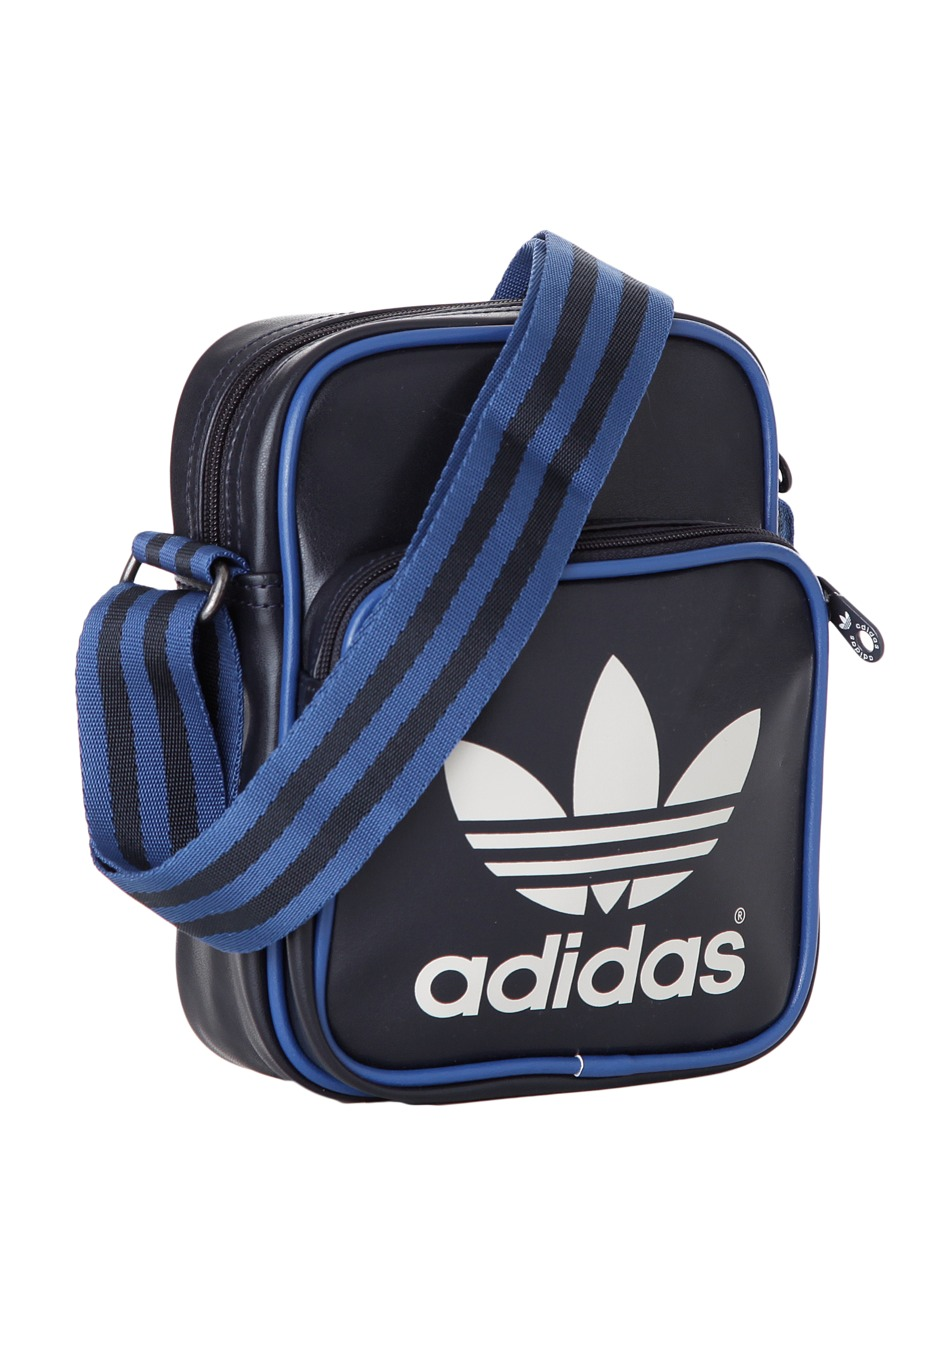 Adidas - Adicolor Mini Legend Ink True Blue - Bag - Streetwear Shop -  Impericon.com UK 26b6166db0481